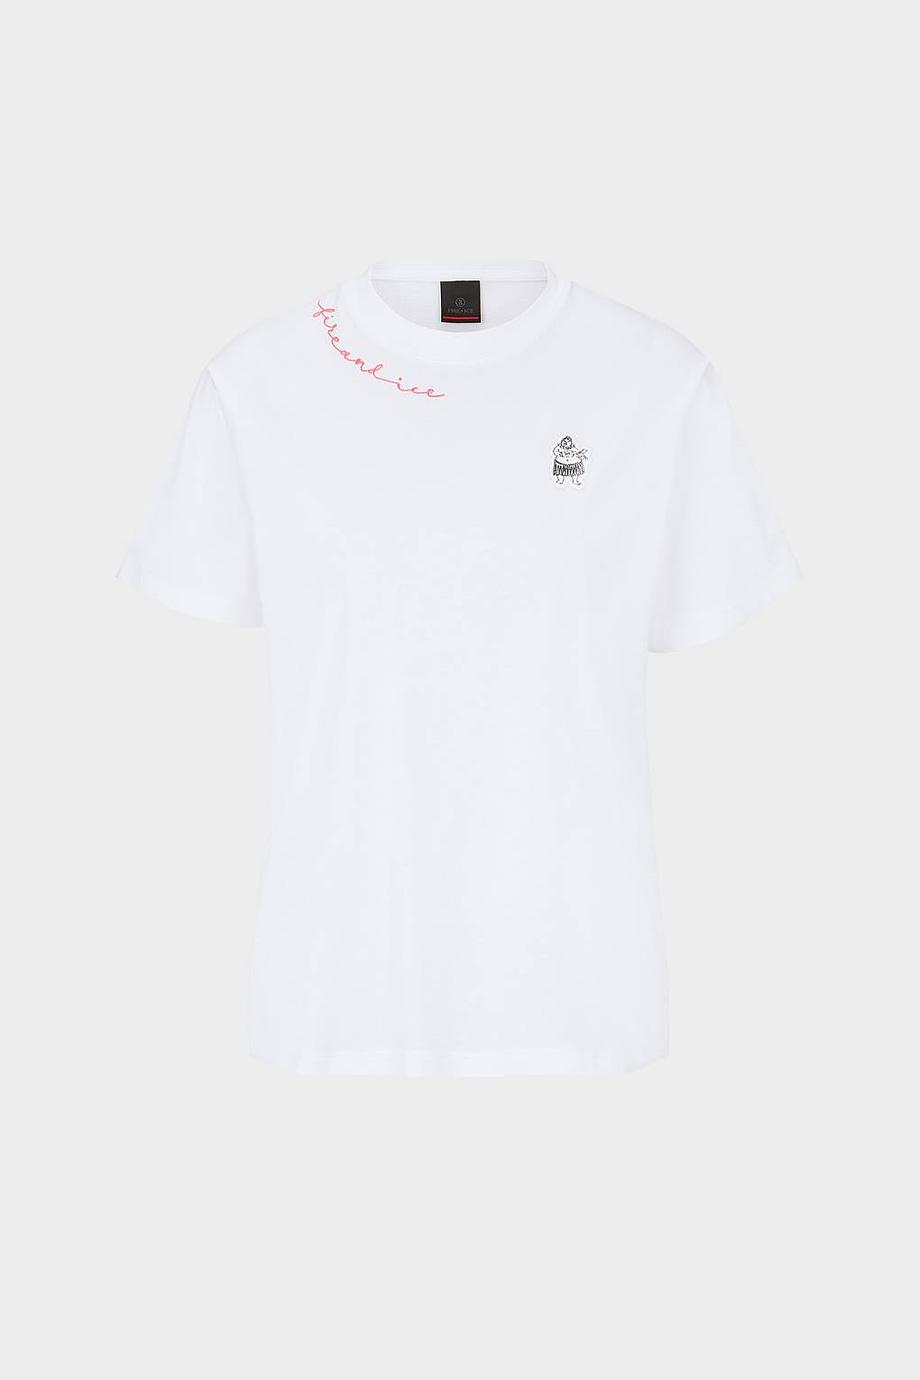 CARRIE-T-SHIRT-white4